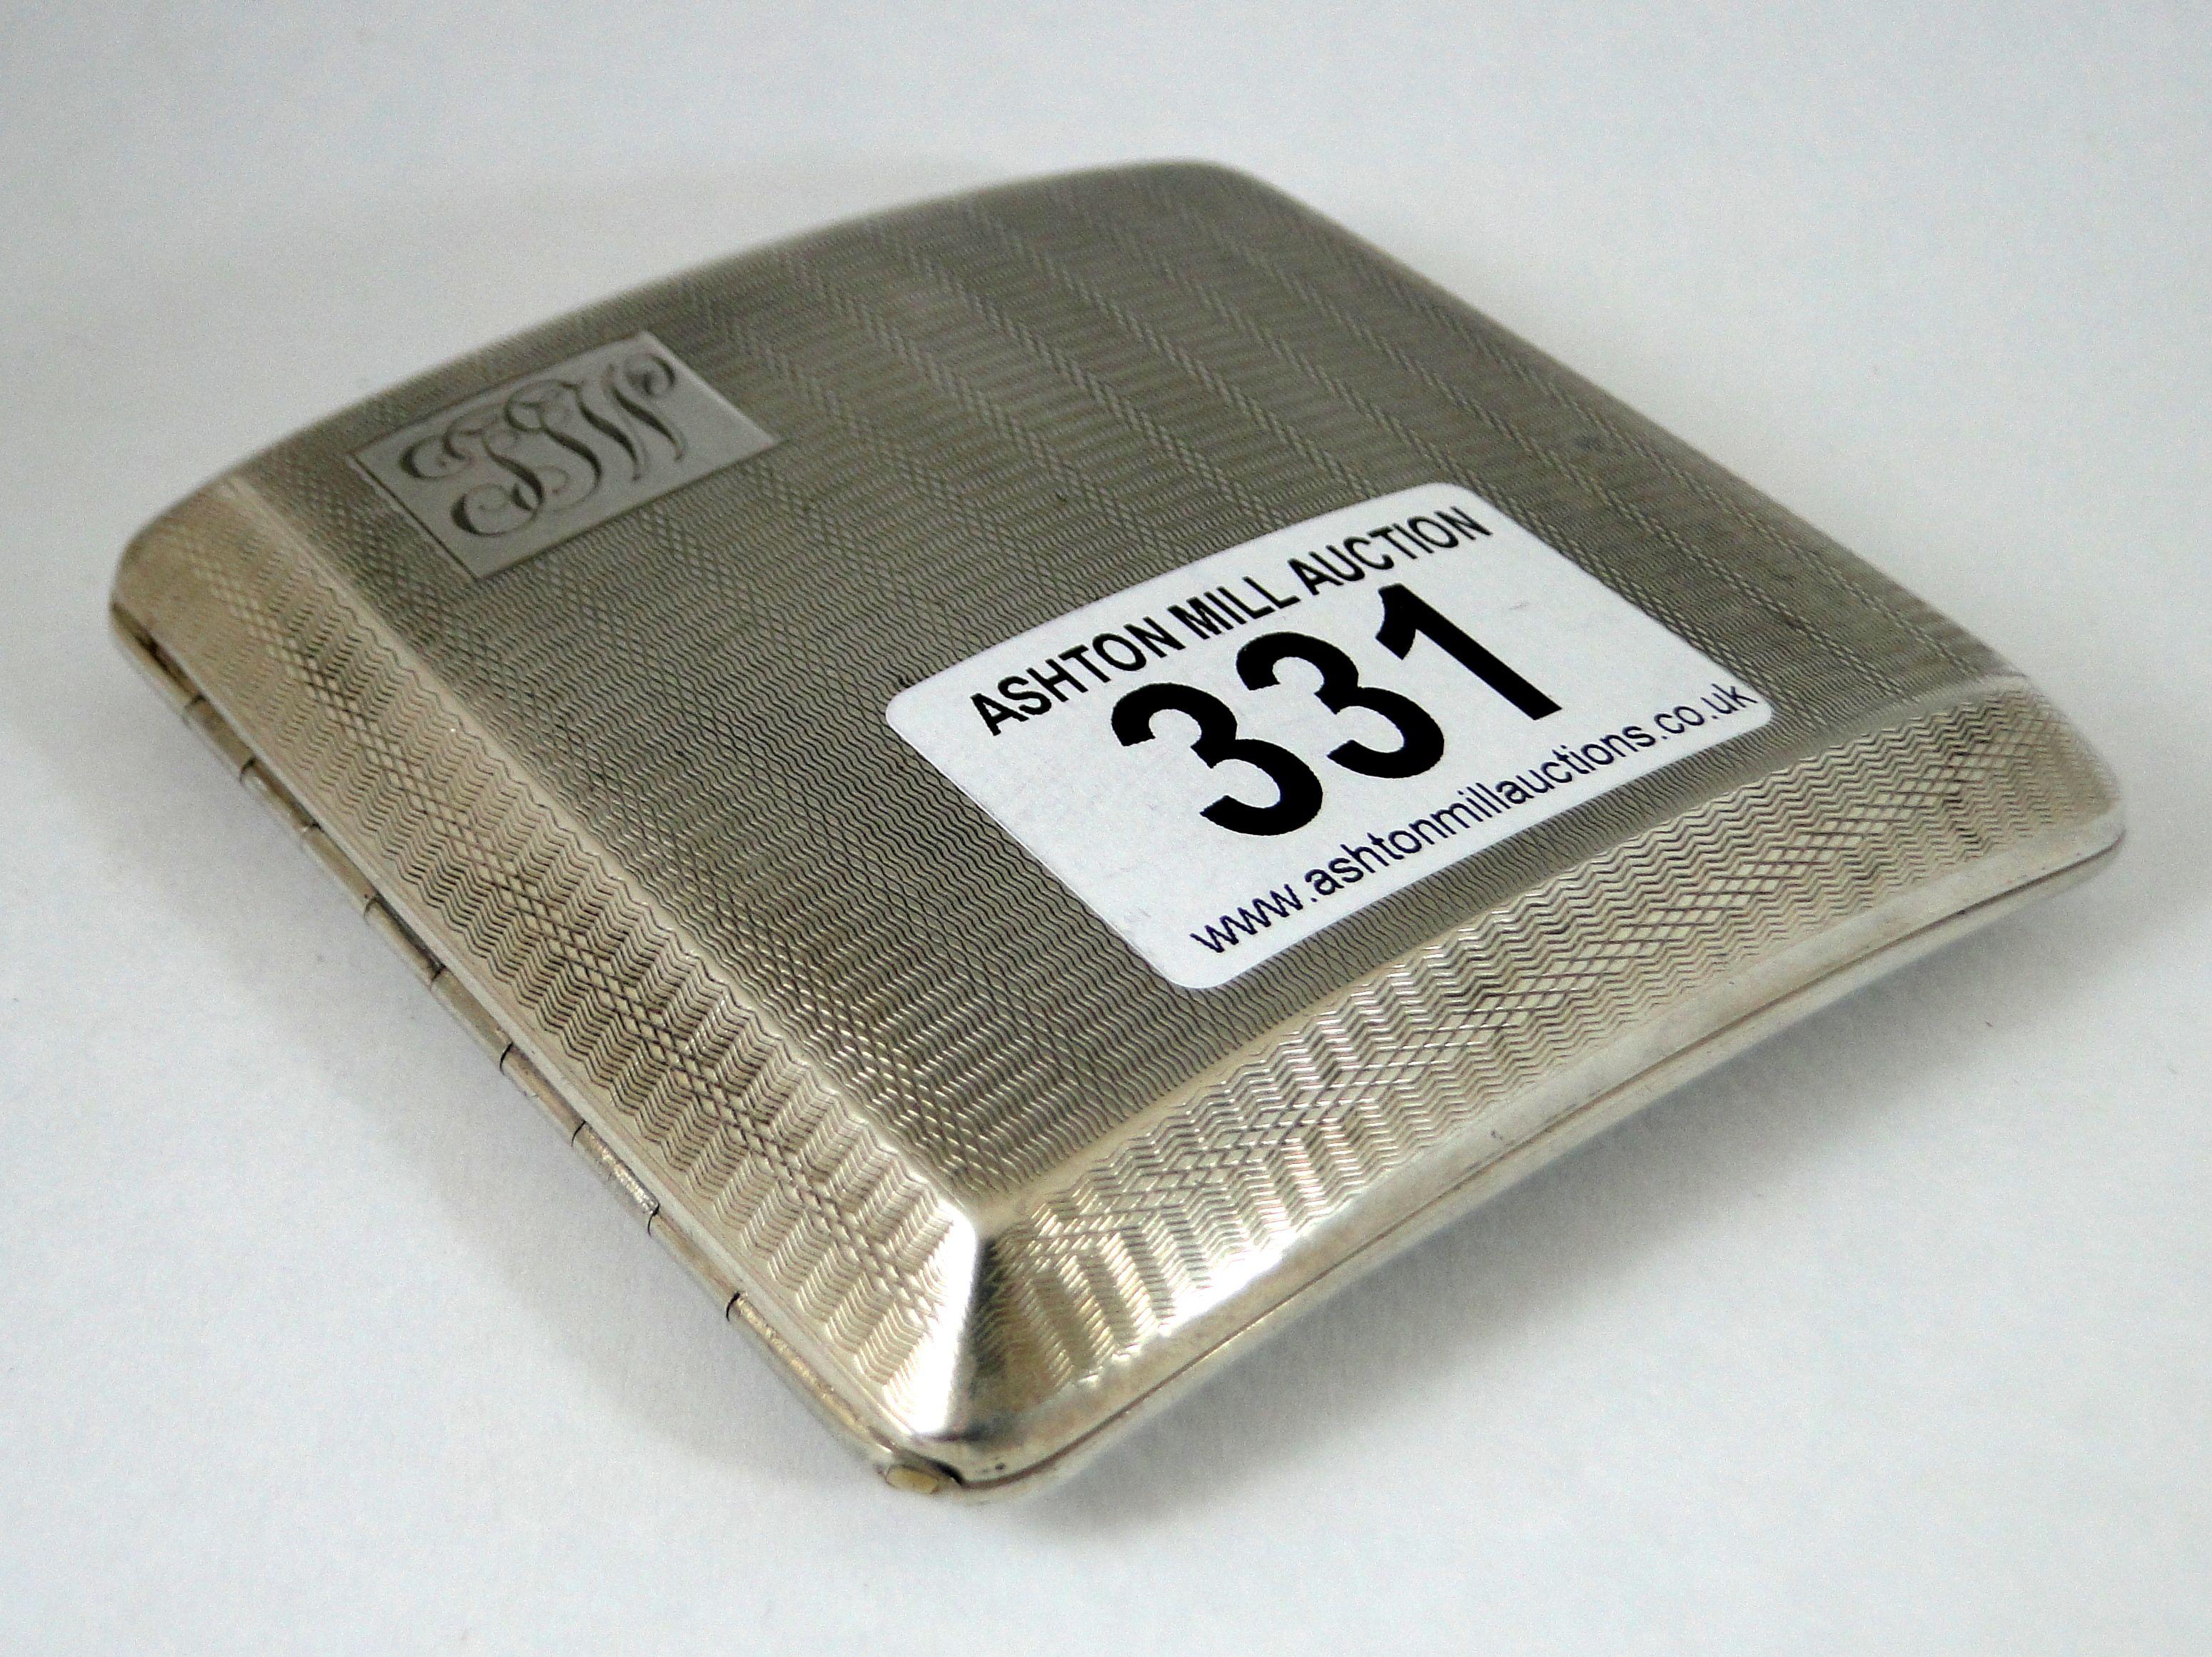 331) Art deco period curved silver engine turned cigarette case – Birmingham 1928 – 100g Est. £30-£40